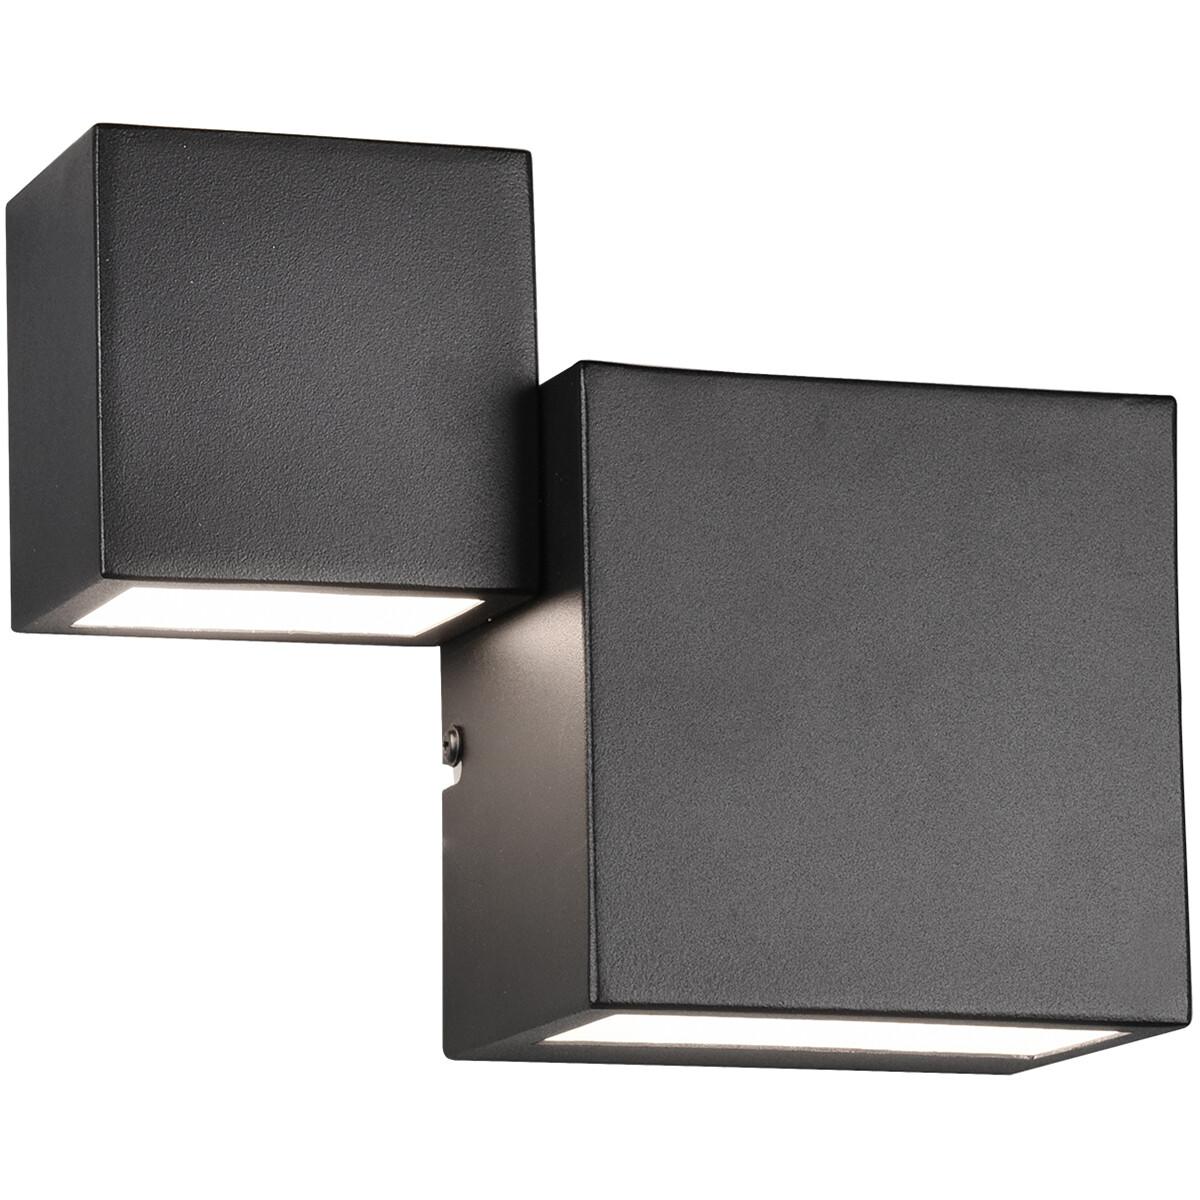 LED Wandlamp - Wandverlichting - Trion Migela - 12W - Warm Wit 3000K - Vierkant - Mat Zwart - Alumin